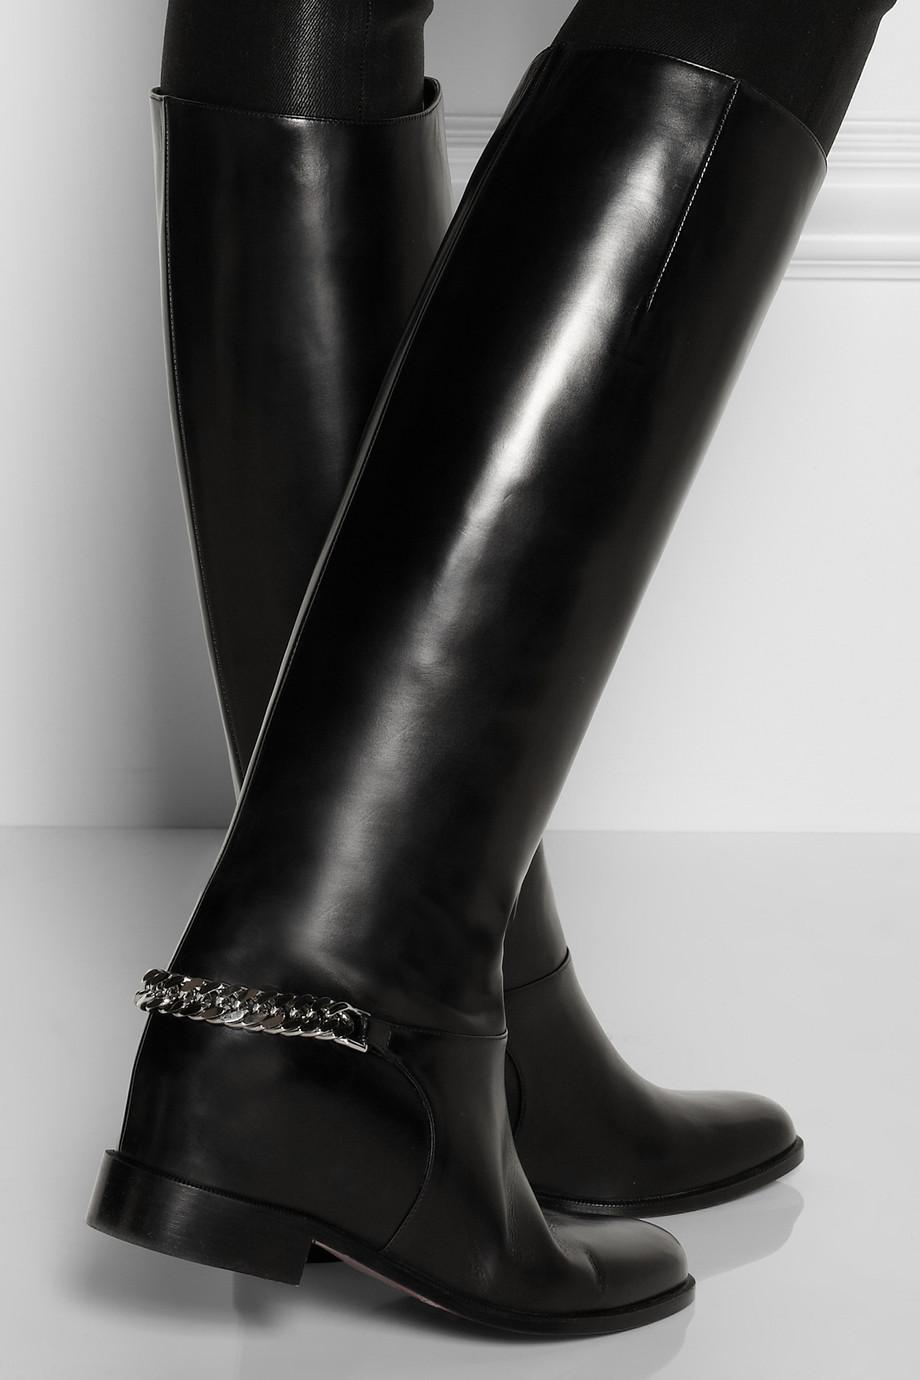 52303e6842c Artesur » christian louboutin Cate riding boots Black leather chain trim